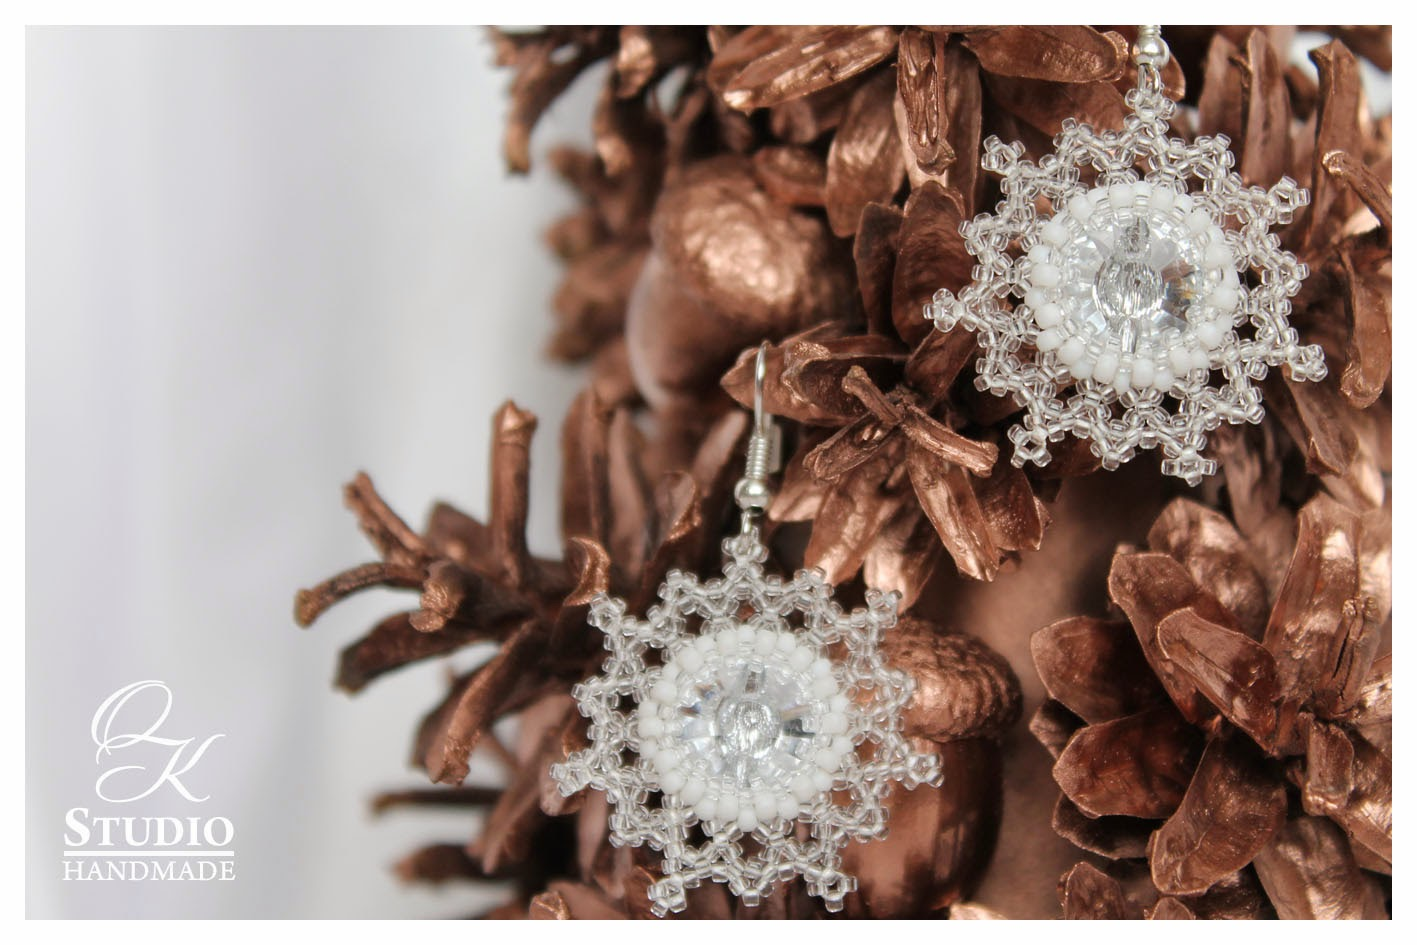 серьги из бисера снежинки мастер-класс